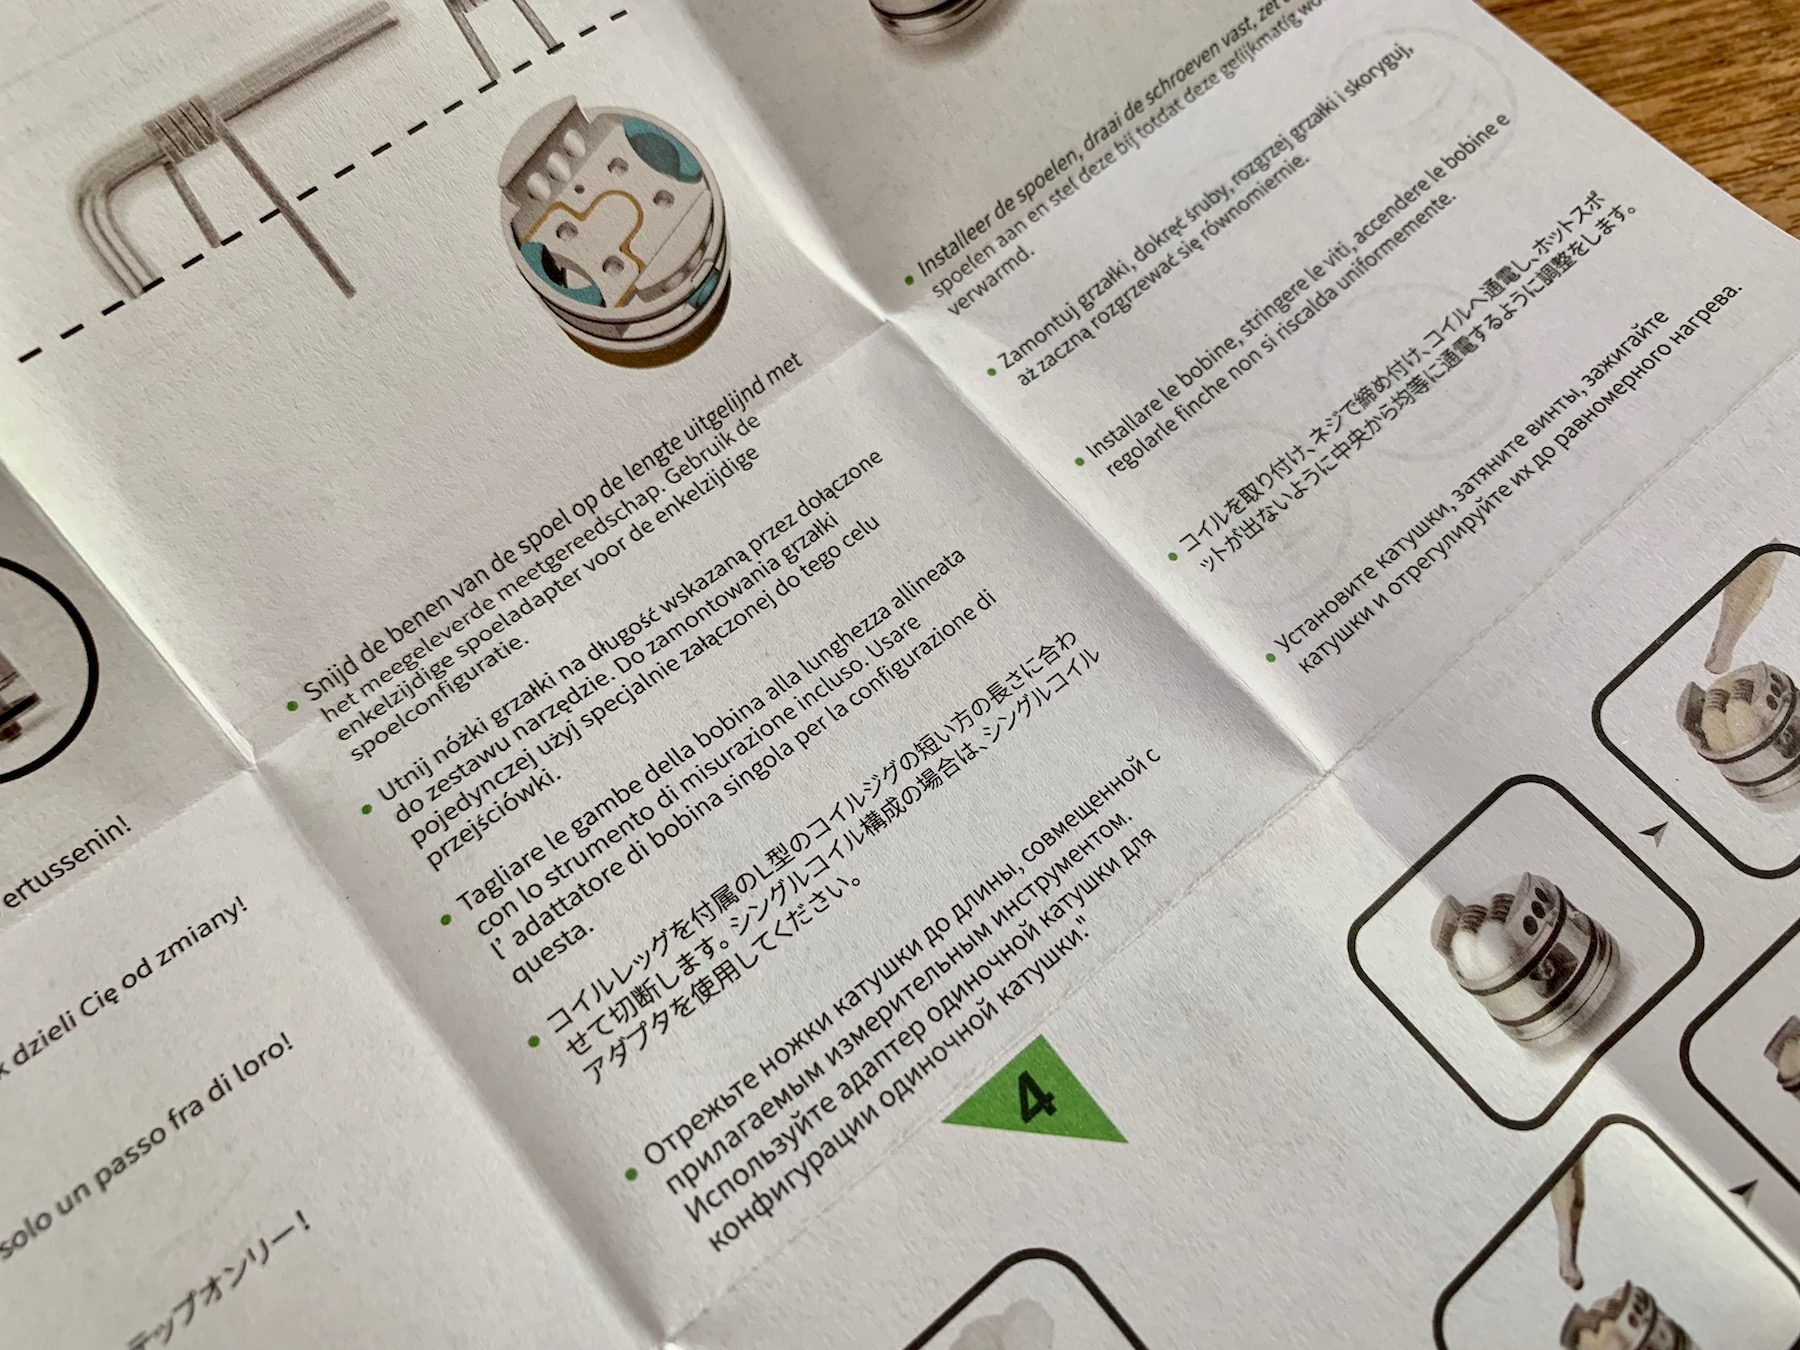 IMG 0077 - 【レビュー】Wotofo Faris RDTA アトマイザー。RDTAとRDA両用の凄いヤツ!!爆煙フレーバーチェイサーモデルのアトマ。